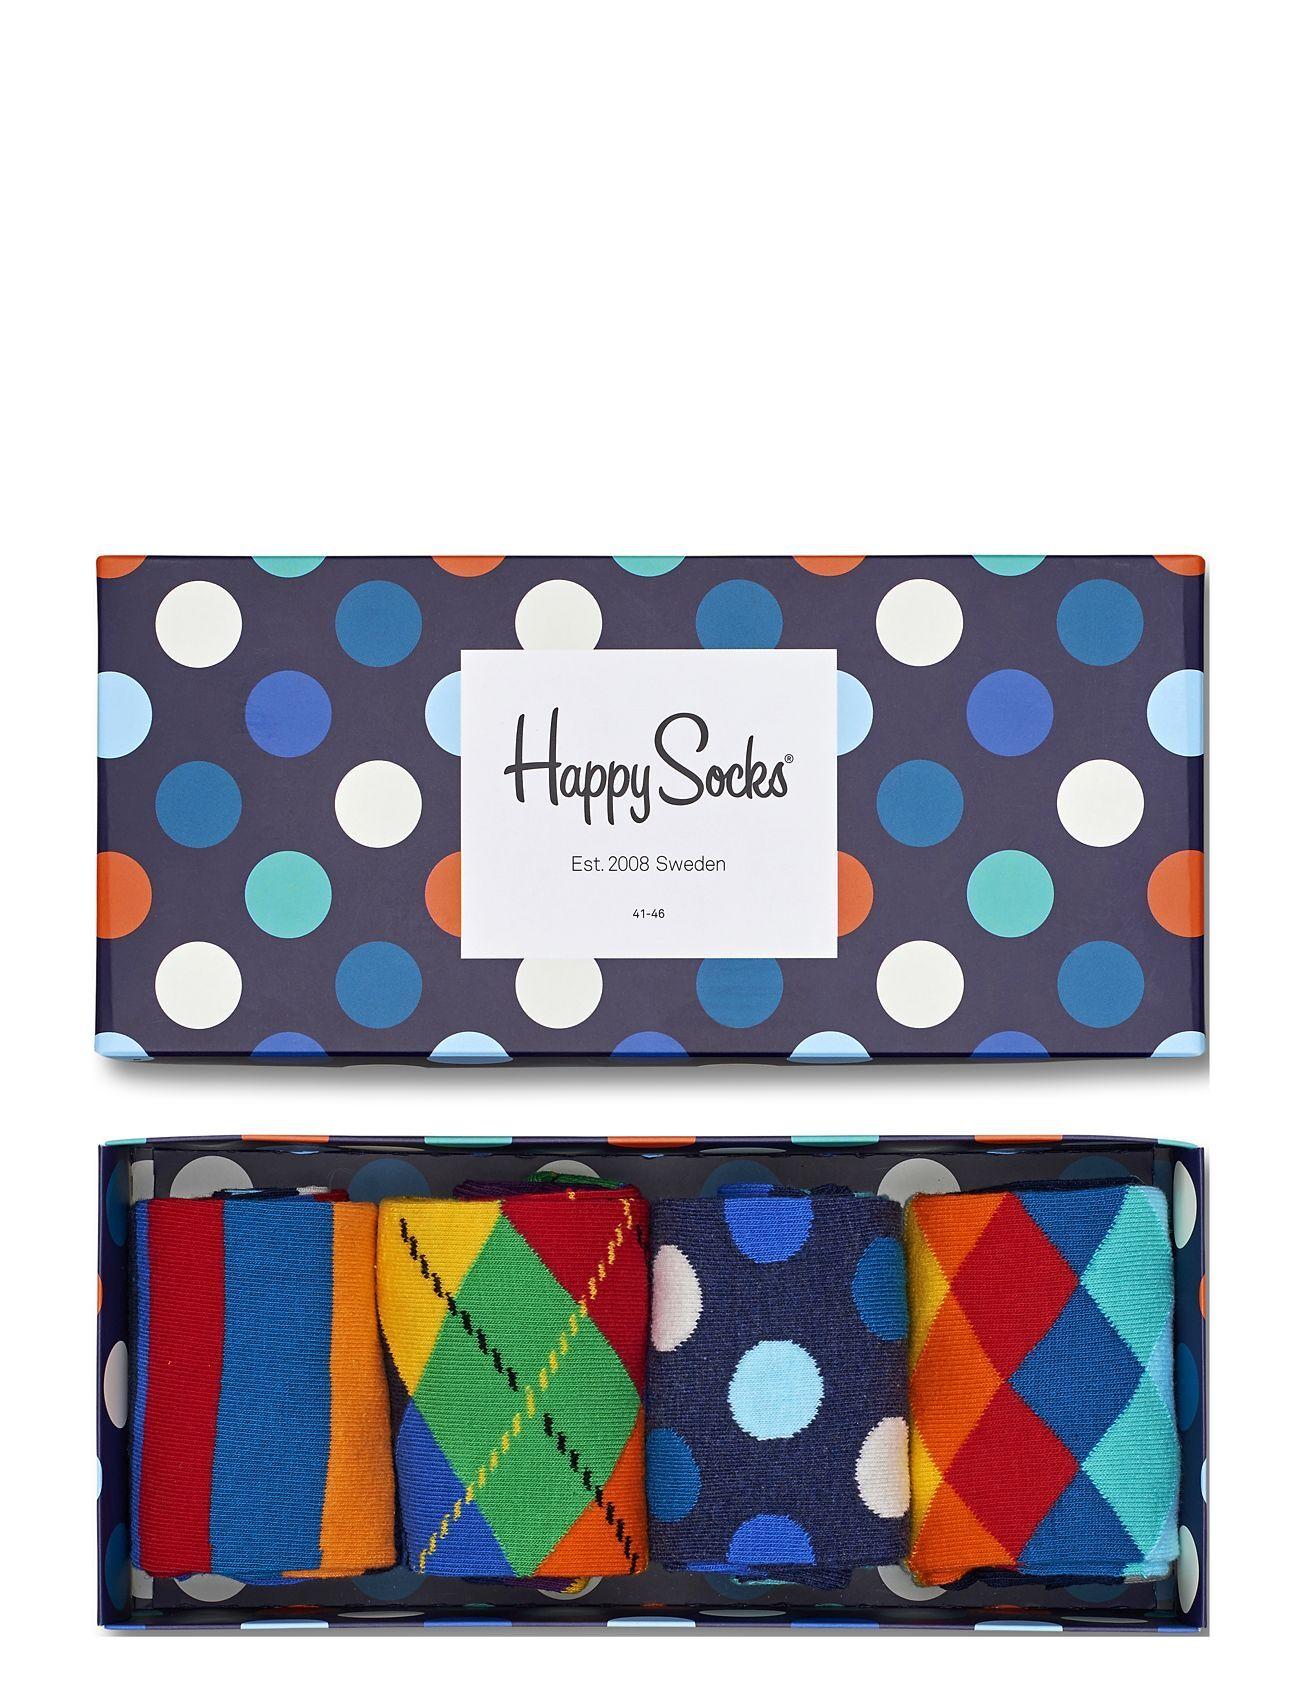 Happy Socks 4-Pack Multi-Color Socks Gift Set Underwear Socks Regular Socks Monivärinen/Kuvioitu Happy Socks